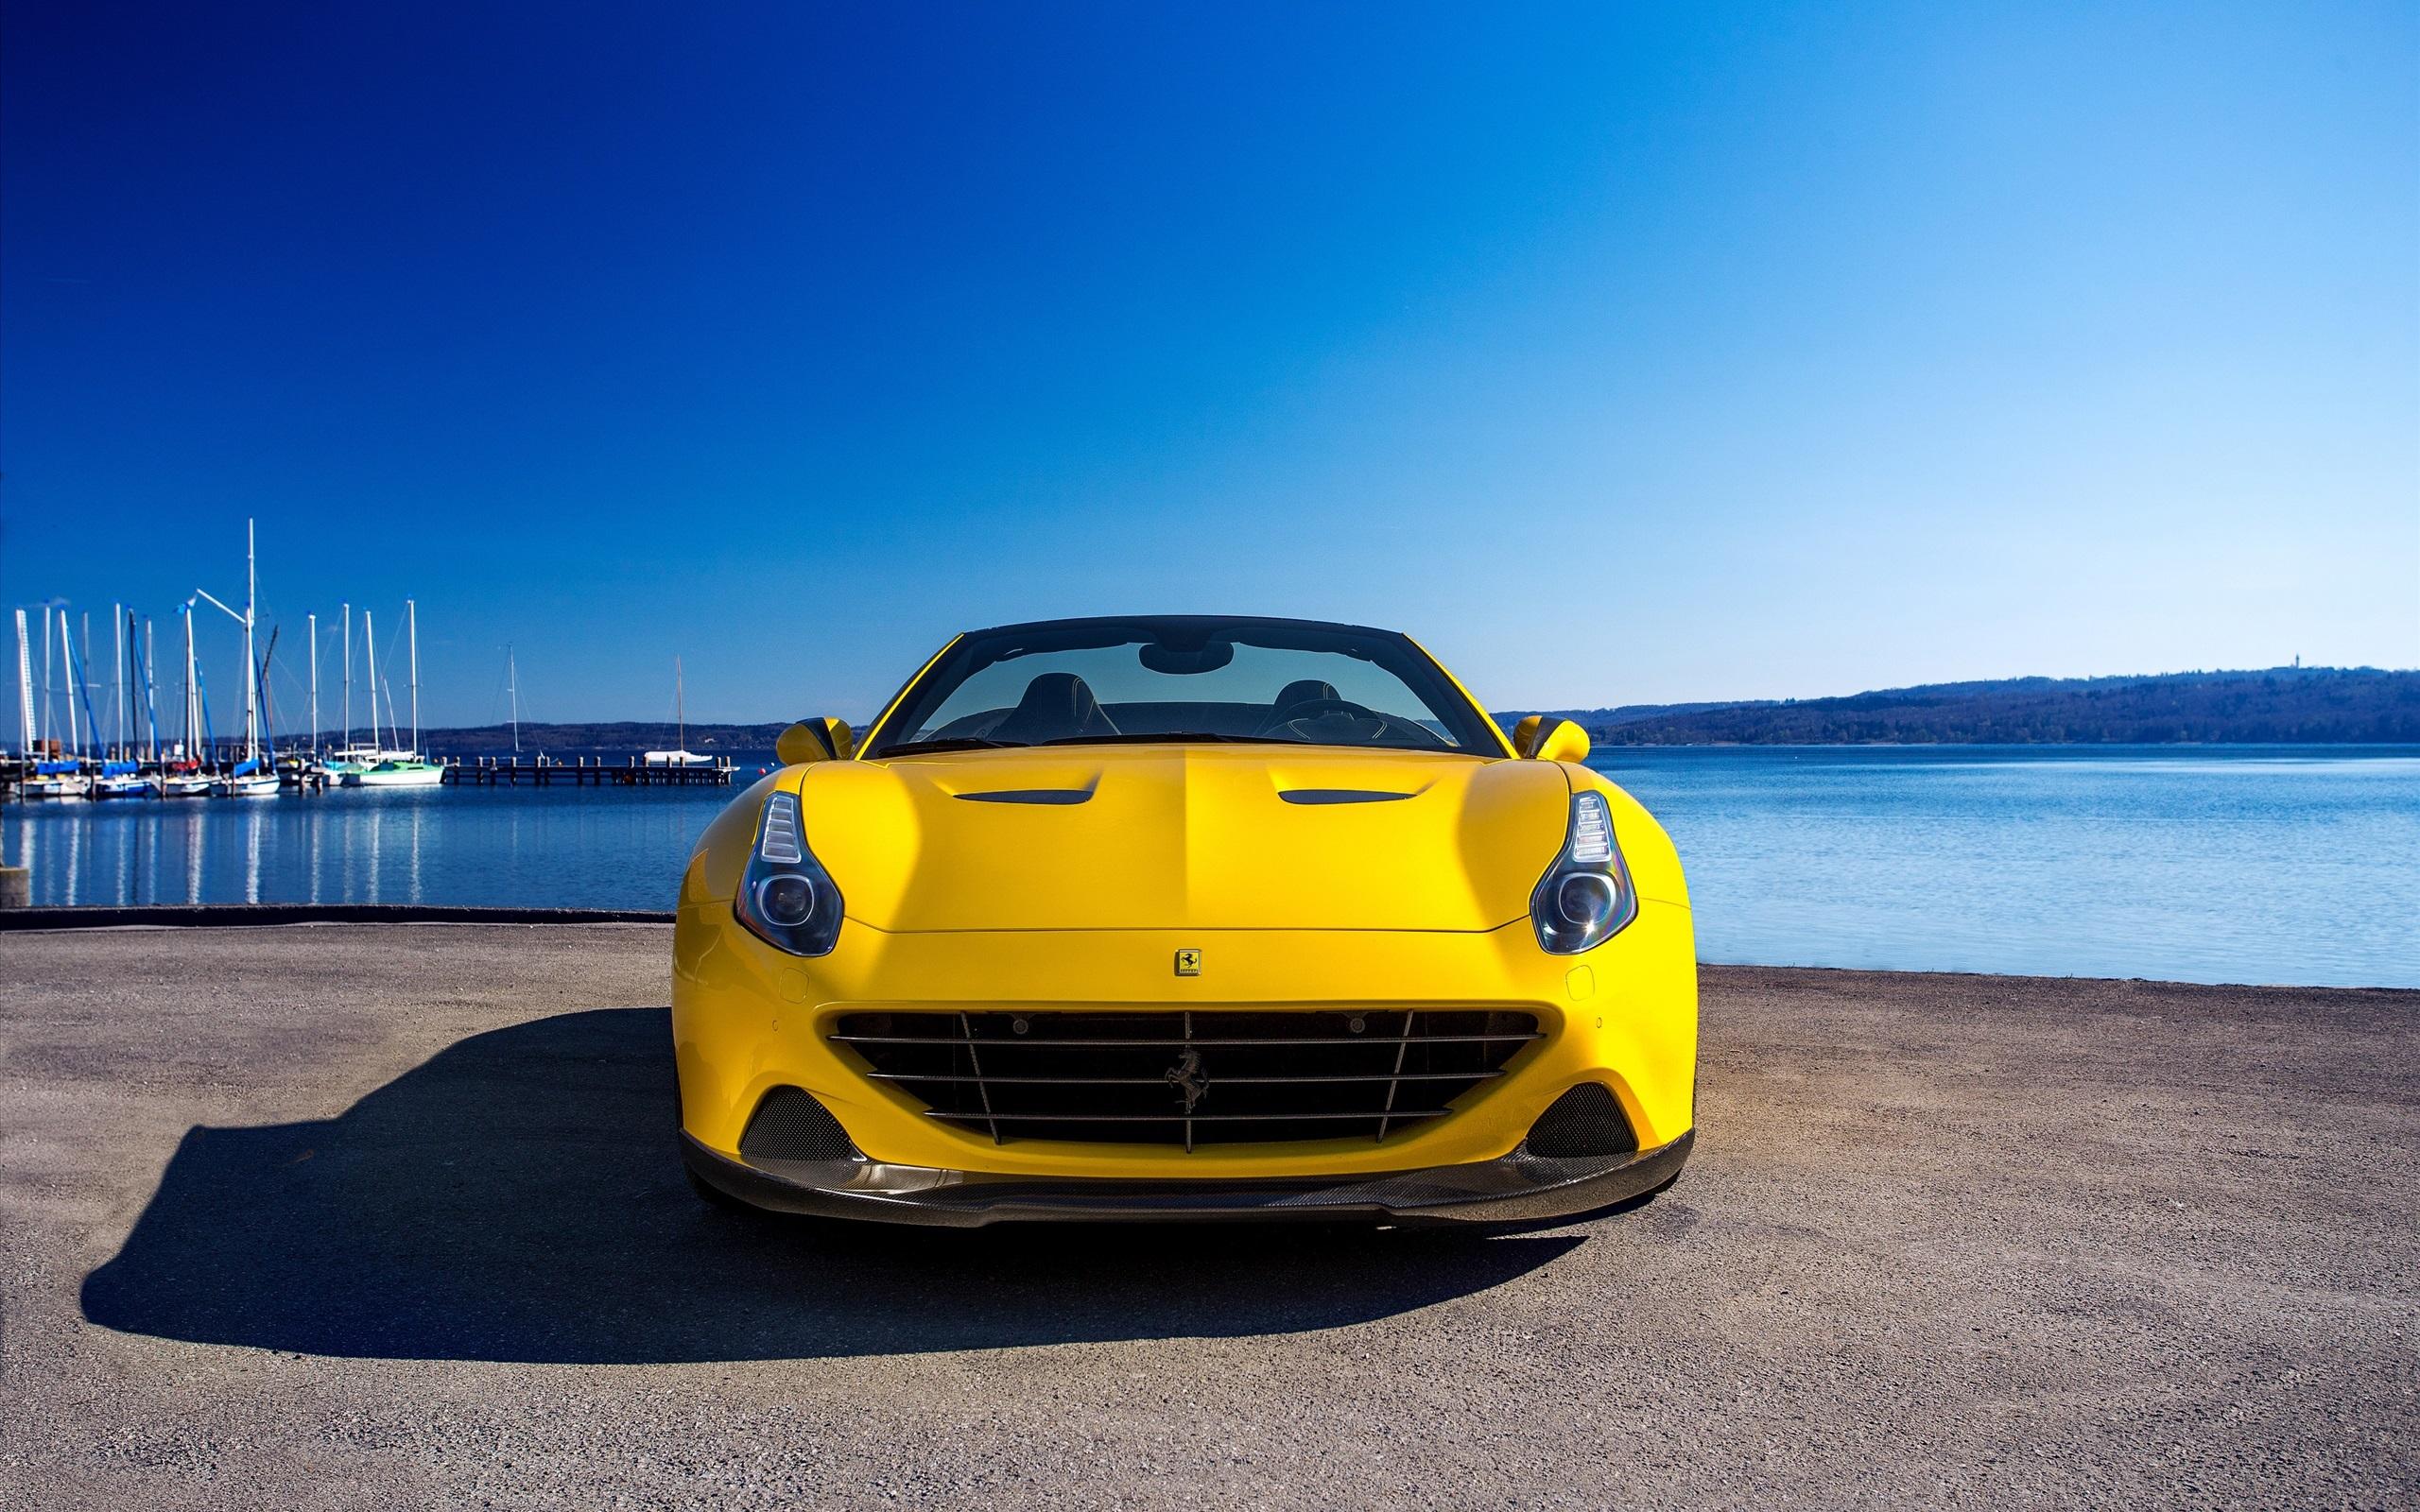 Wallpaper 2015 Pininfarina Ferrari California Yellow Supercar Front View 2560x1600 Hd Picture Image